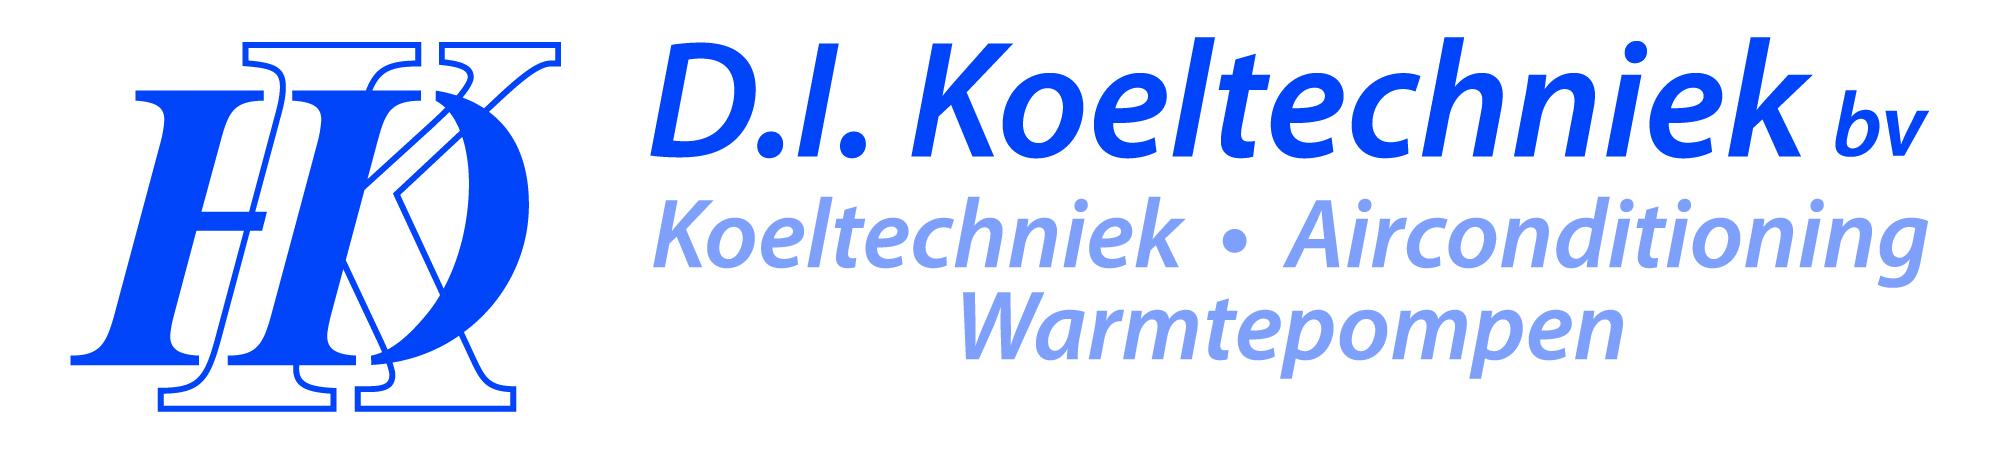 D.I. Koeltechniek | Koeltechniek • Airconditioning • Warmtepompen